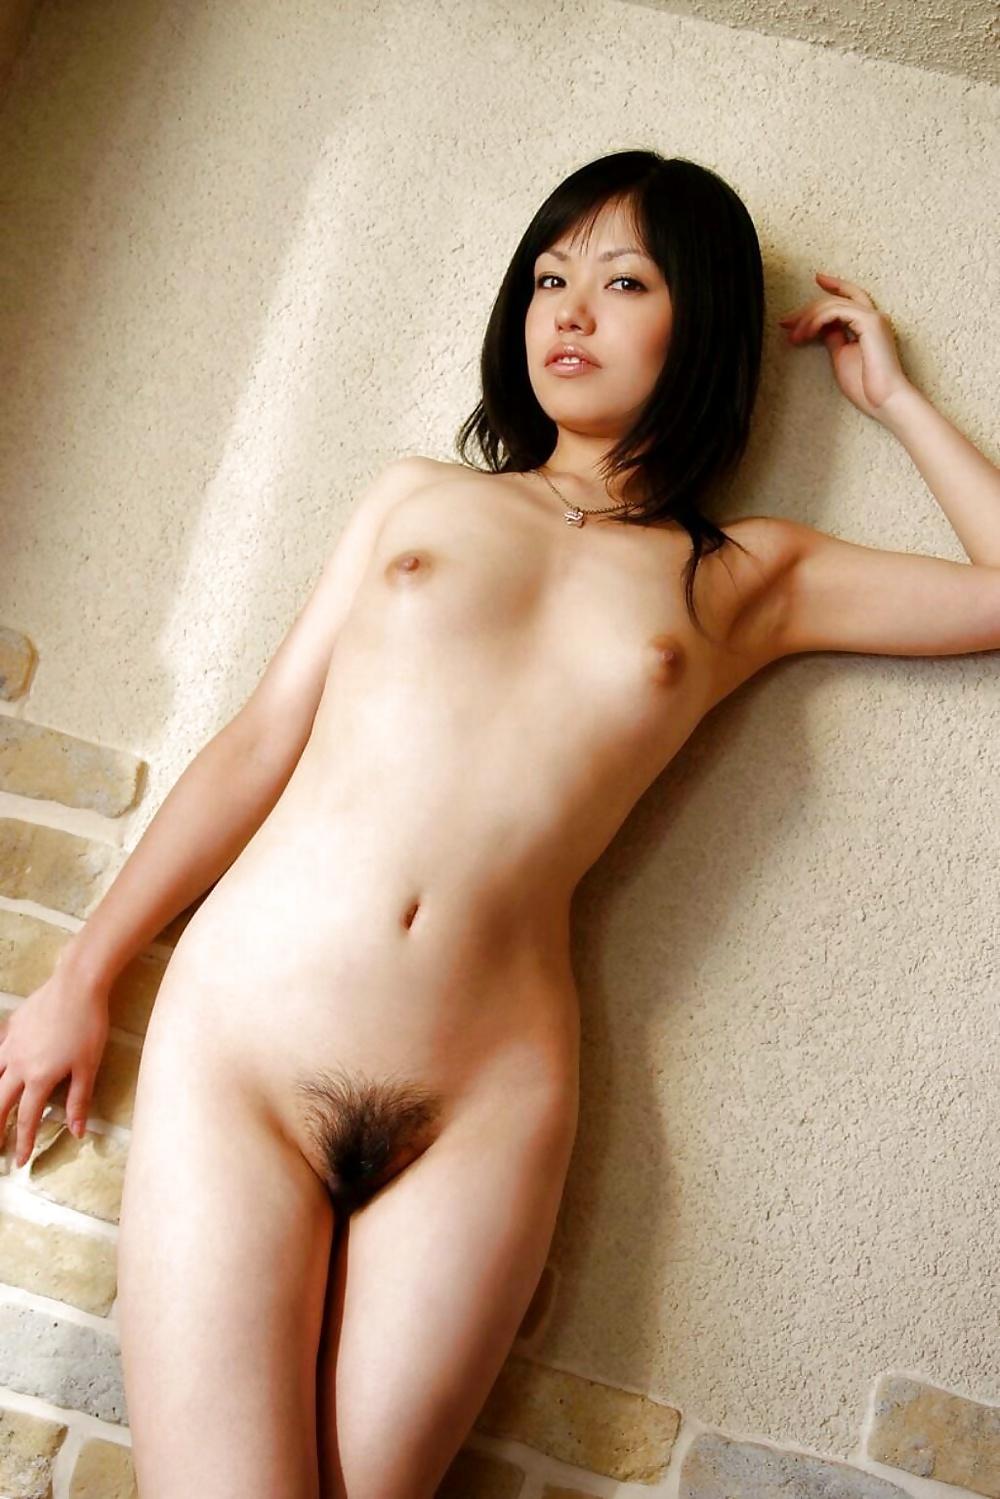 Babe hairy japen naked